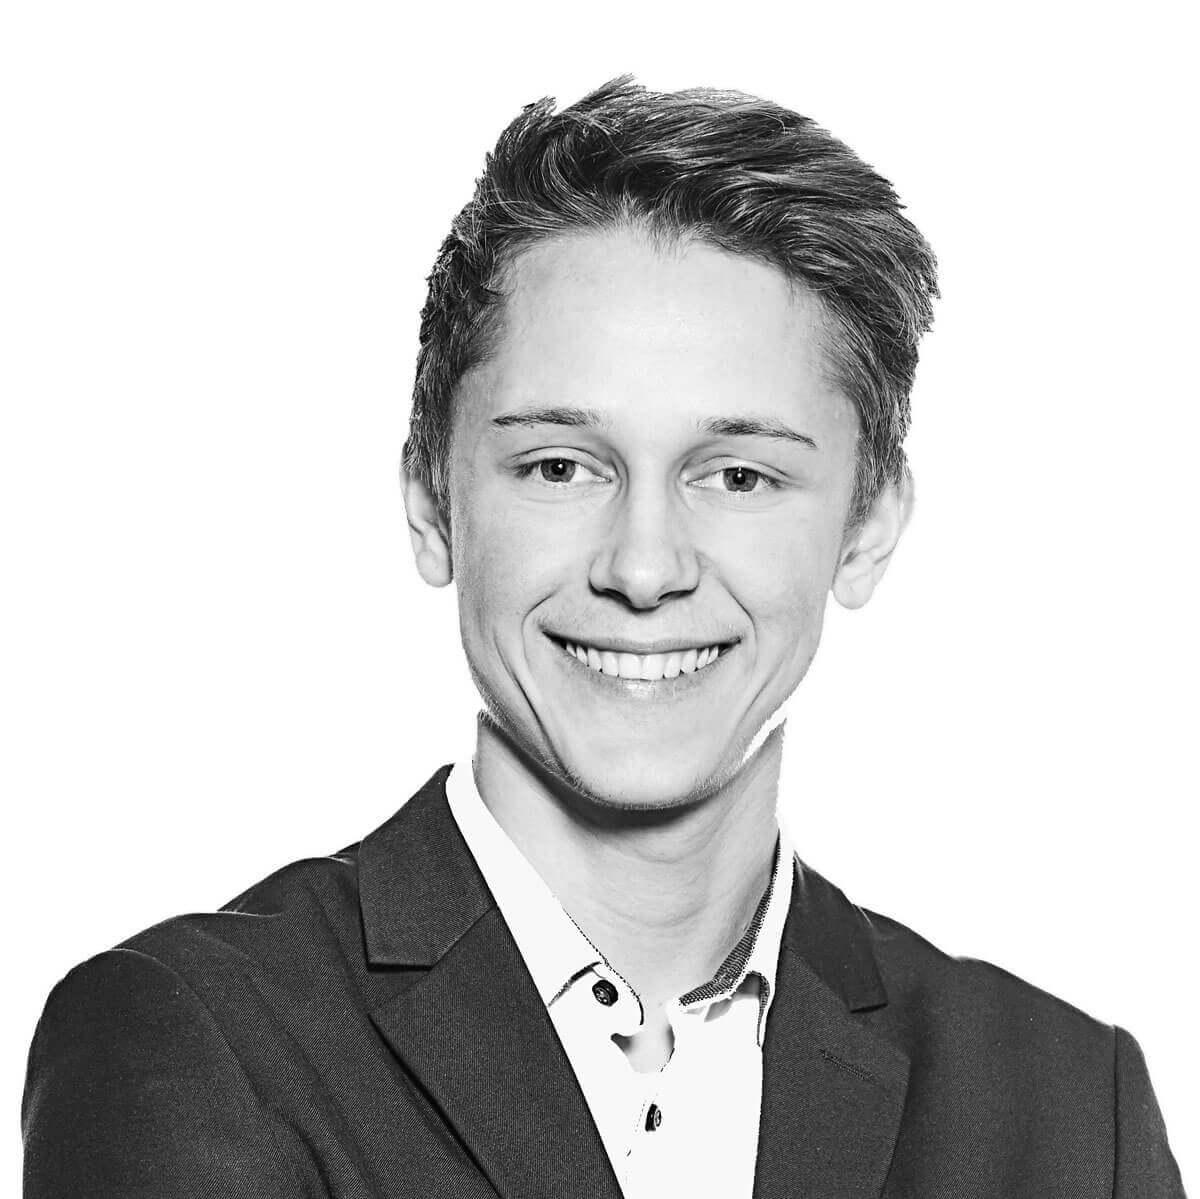 Kristian Scharling